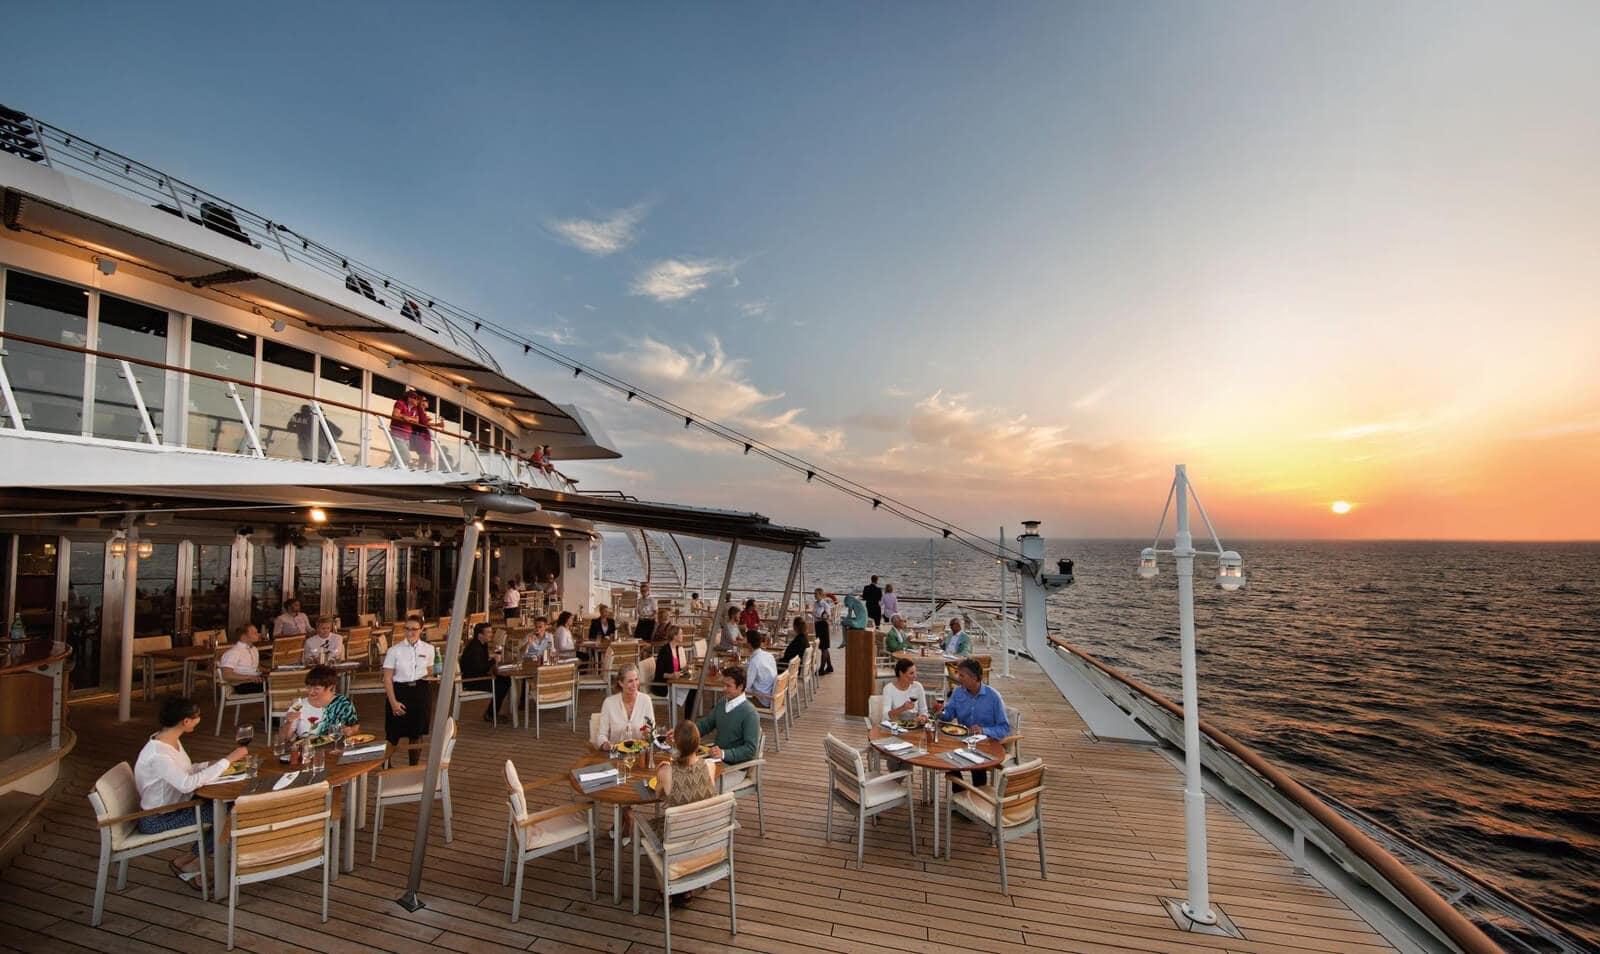 MS Europa - deck